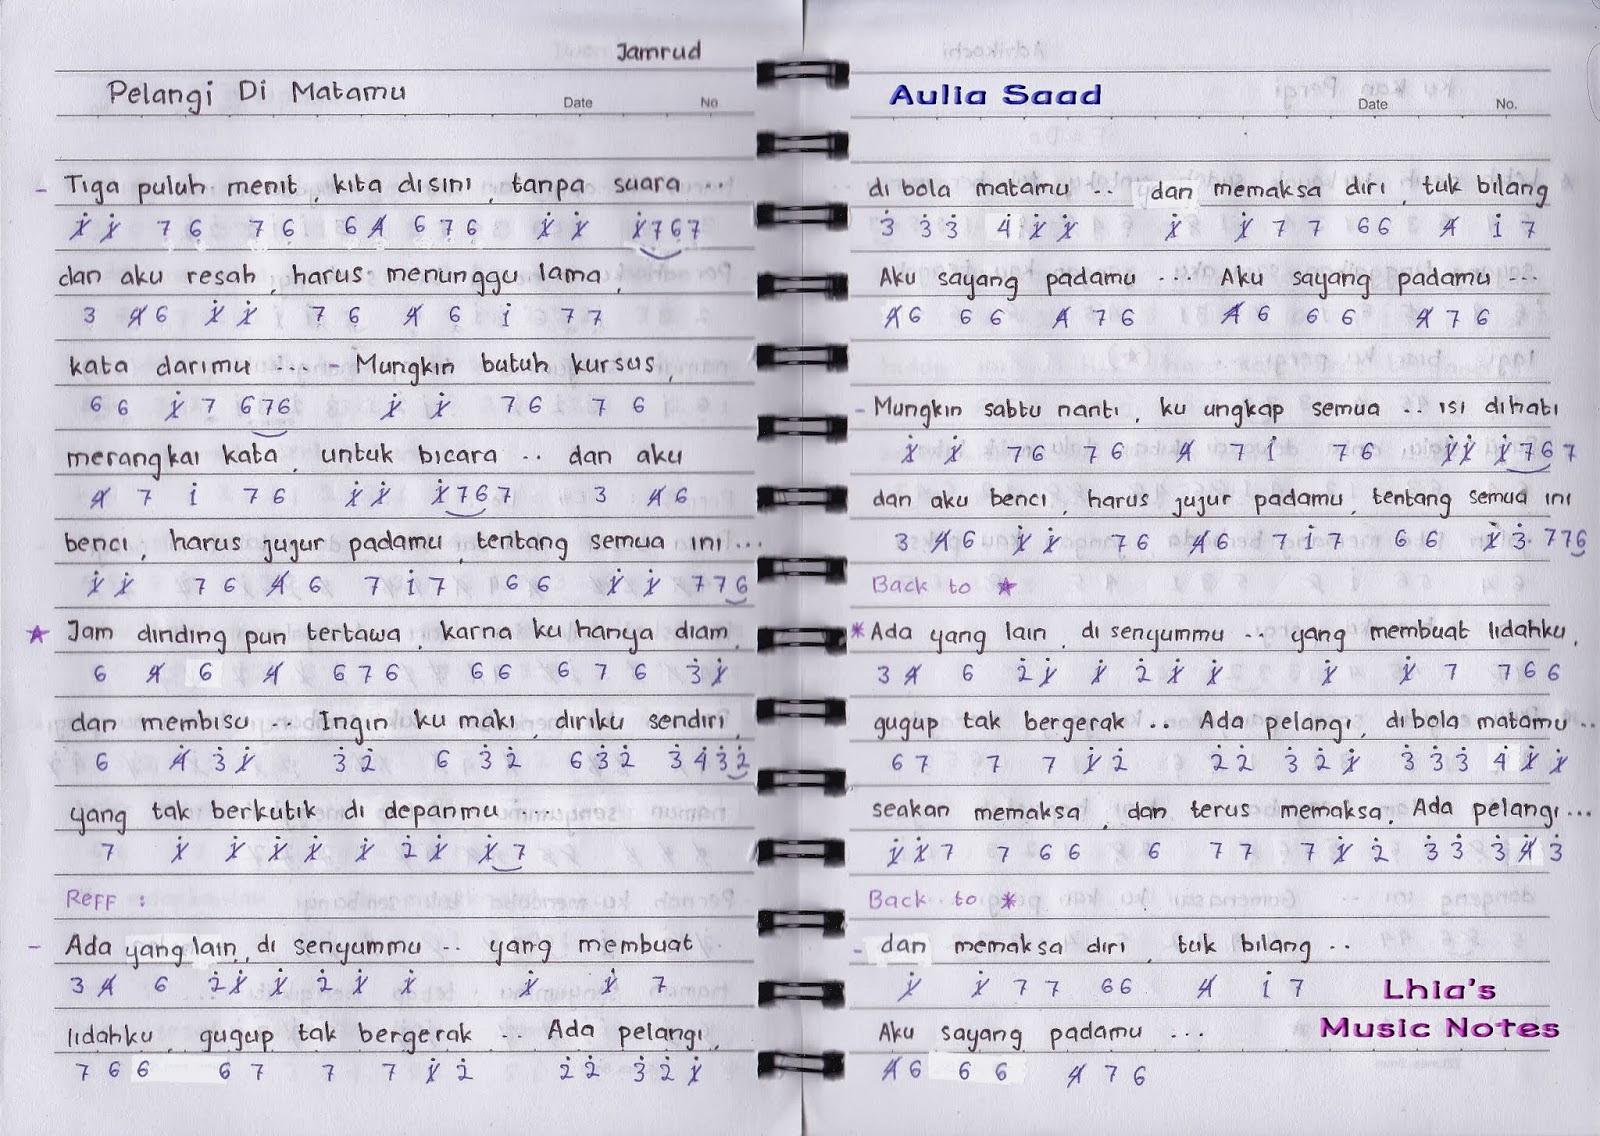 1000 Gambar Chord Gitar Pelangi Dimatamu Paling Keren Gambar Id